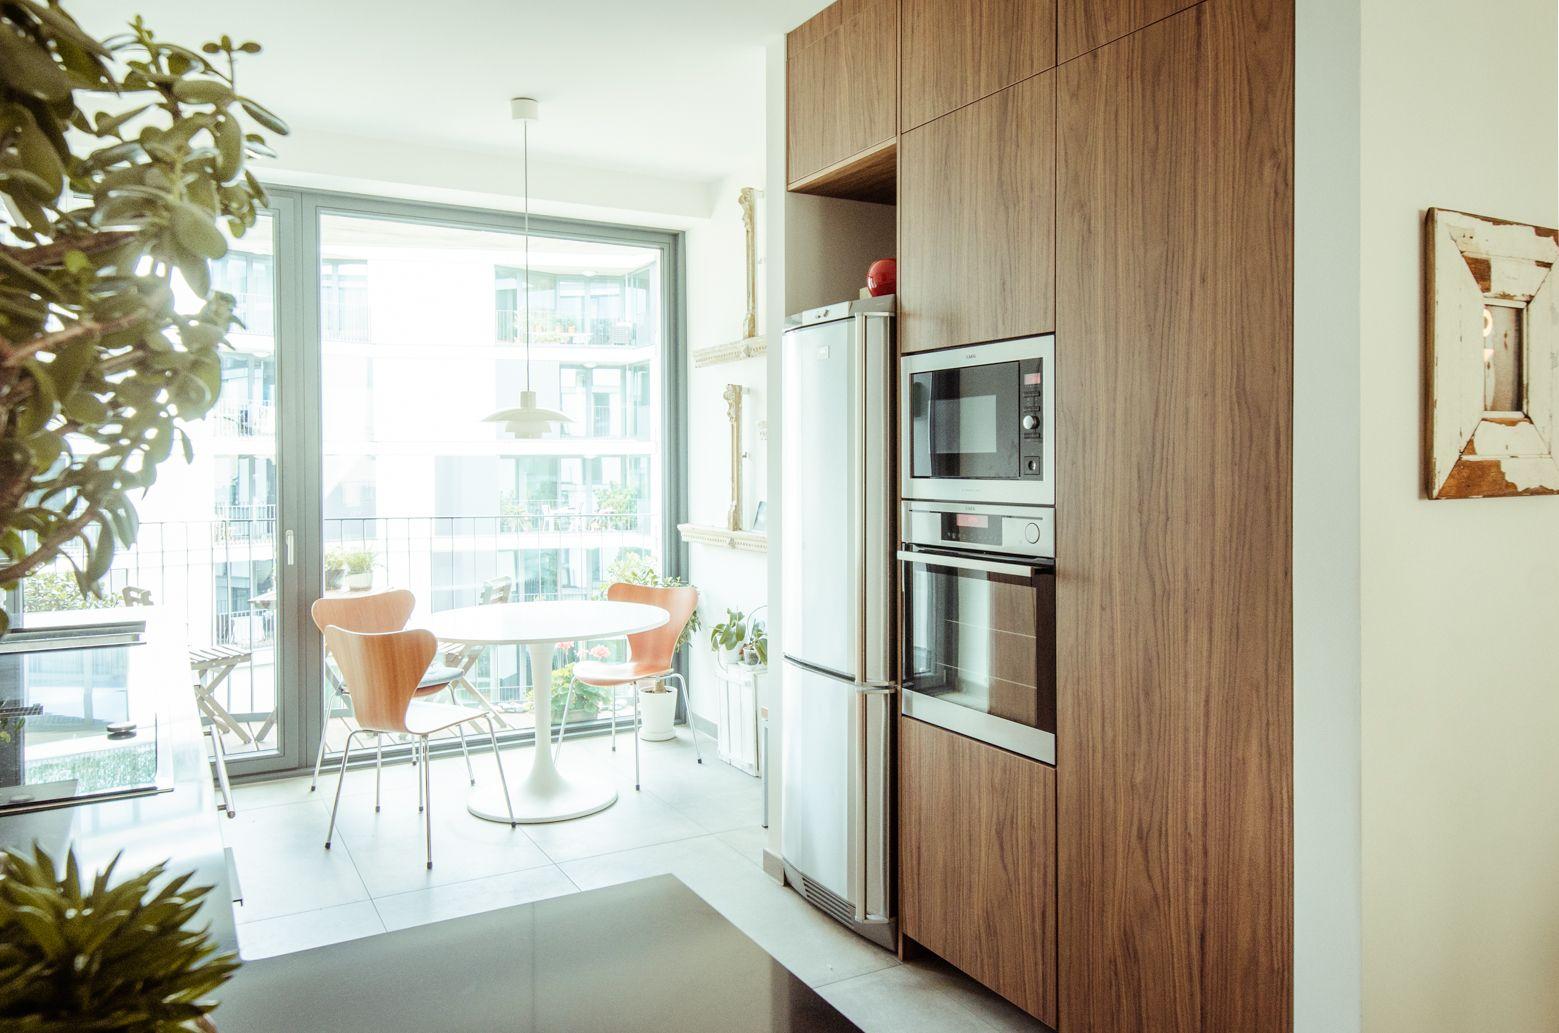 g nstige k chenfronten online bestellen. Black Bedroom Furniture Sets. Home Design Ideas